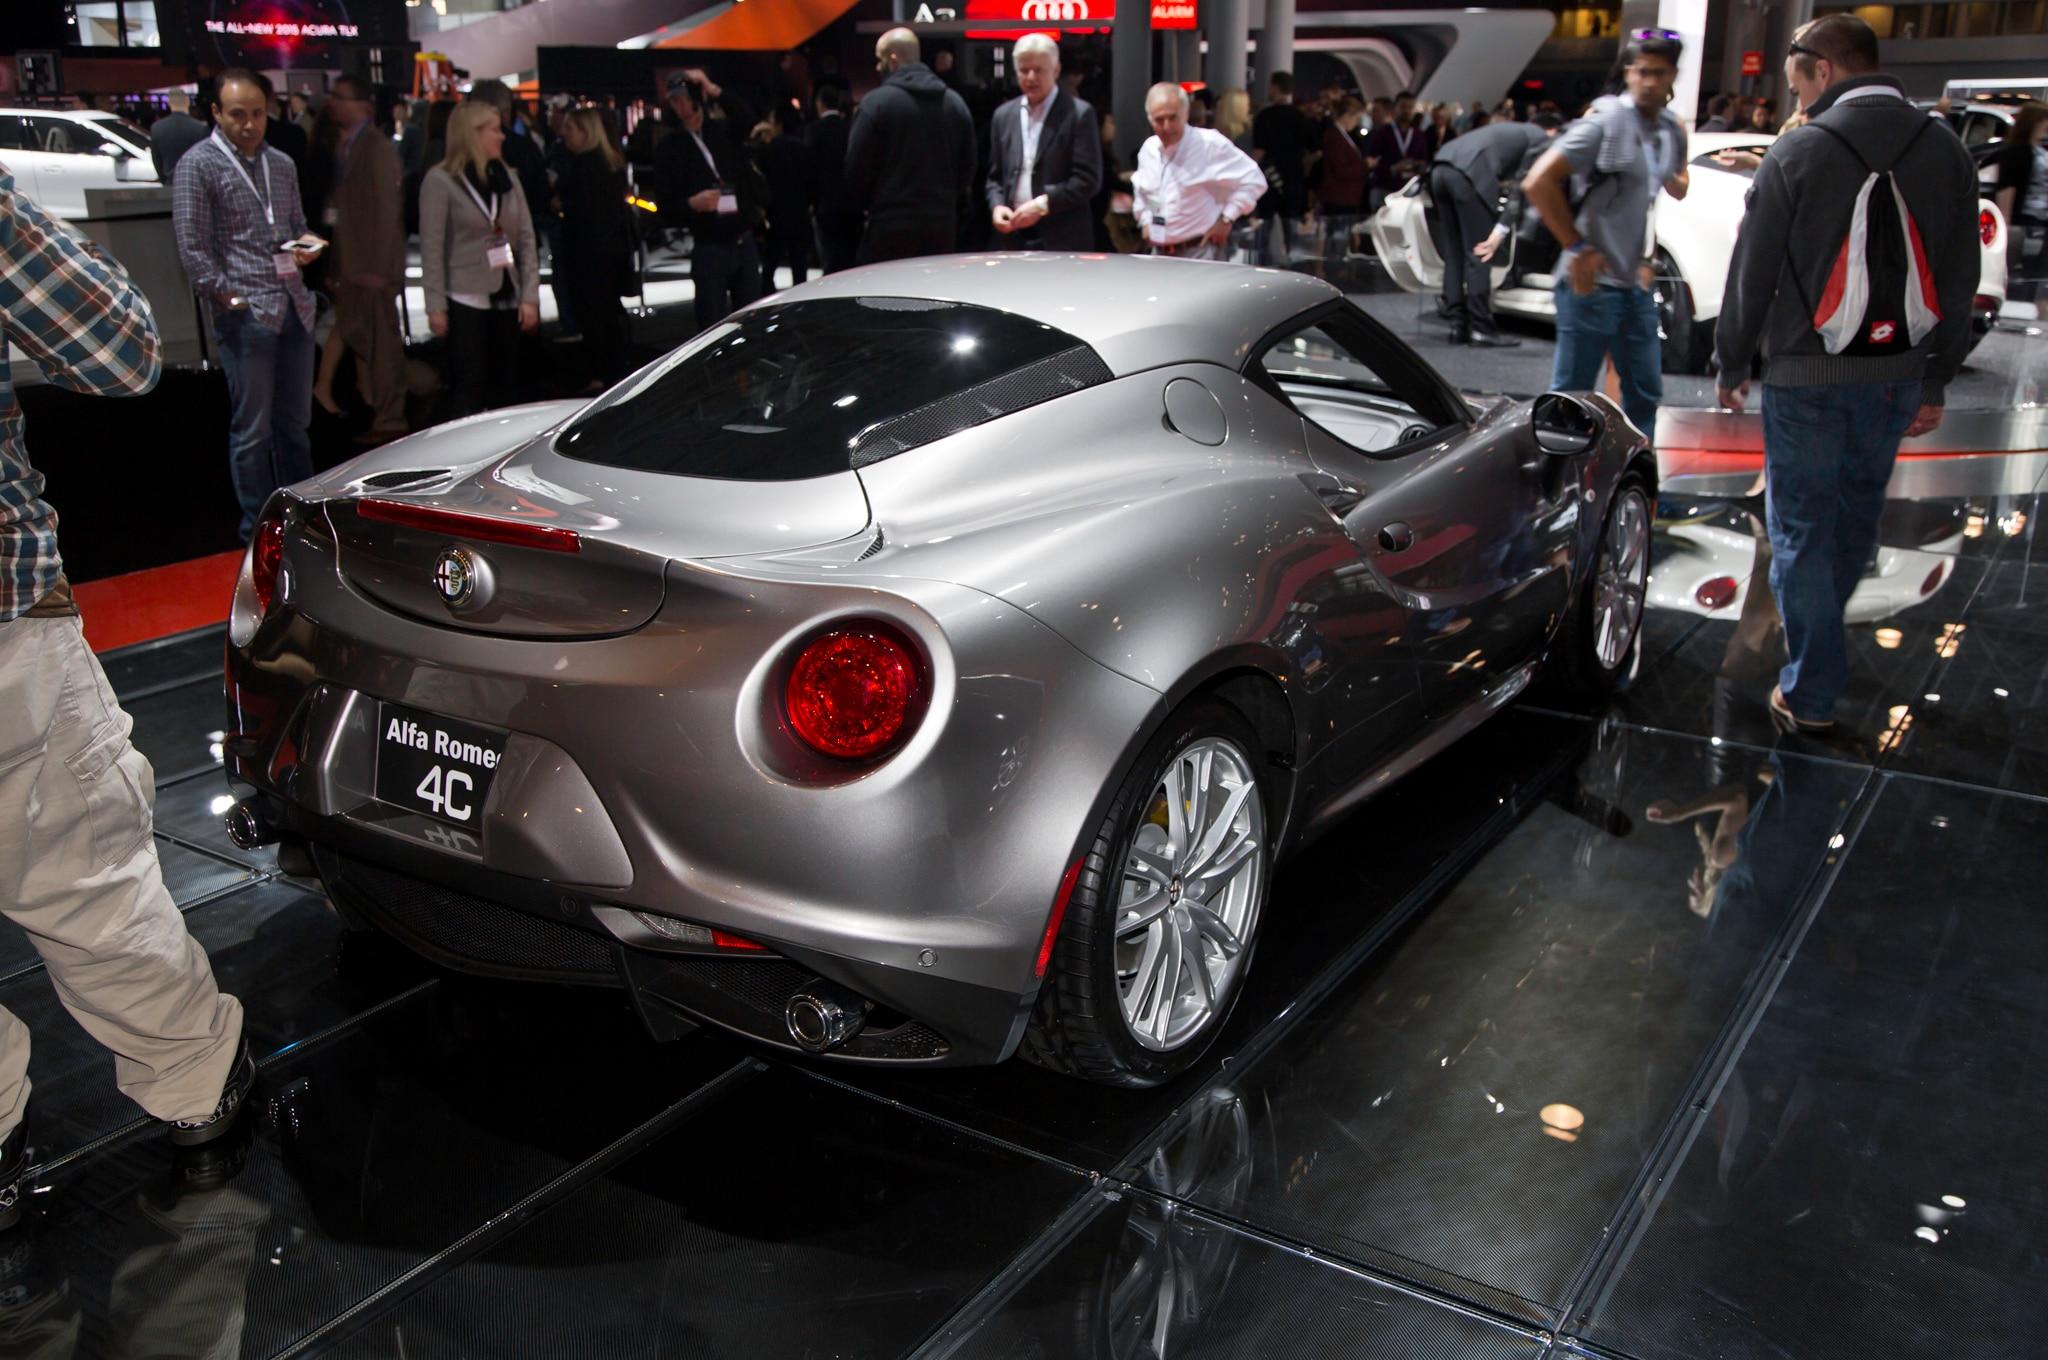 Alfa Romeo Announces List Of U.S. Dealerships